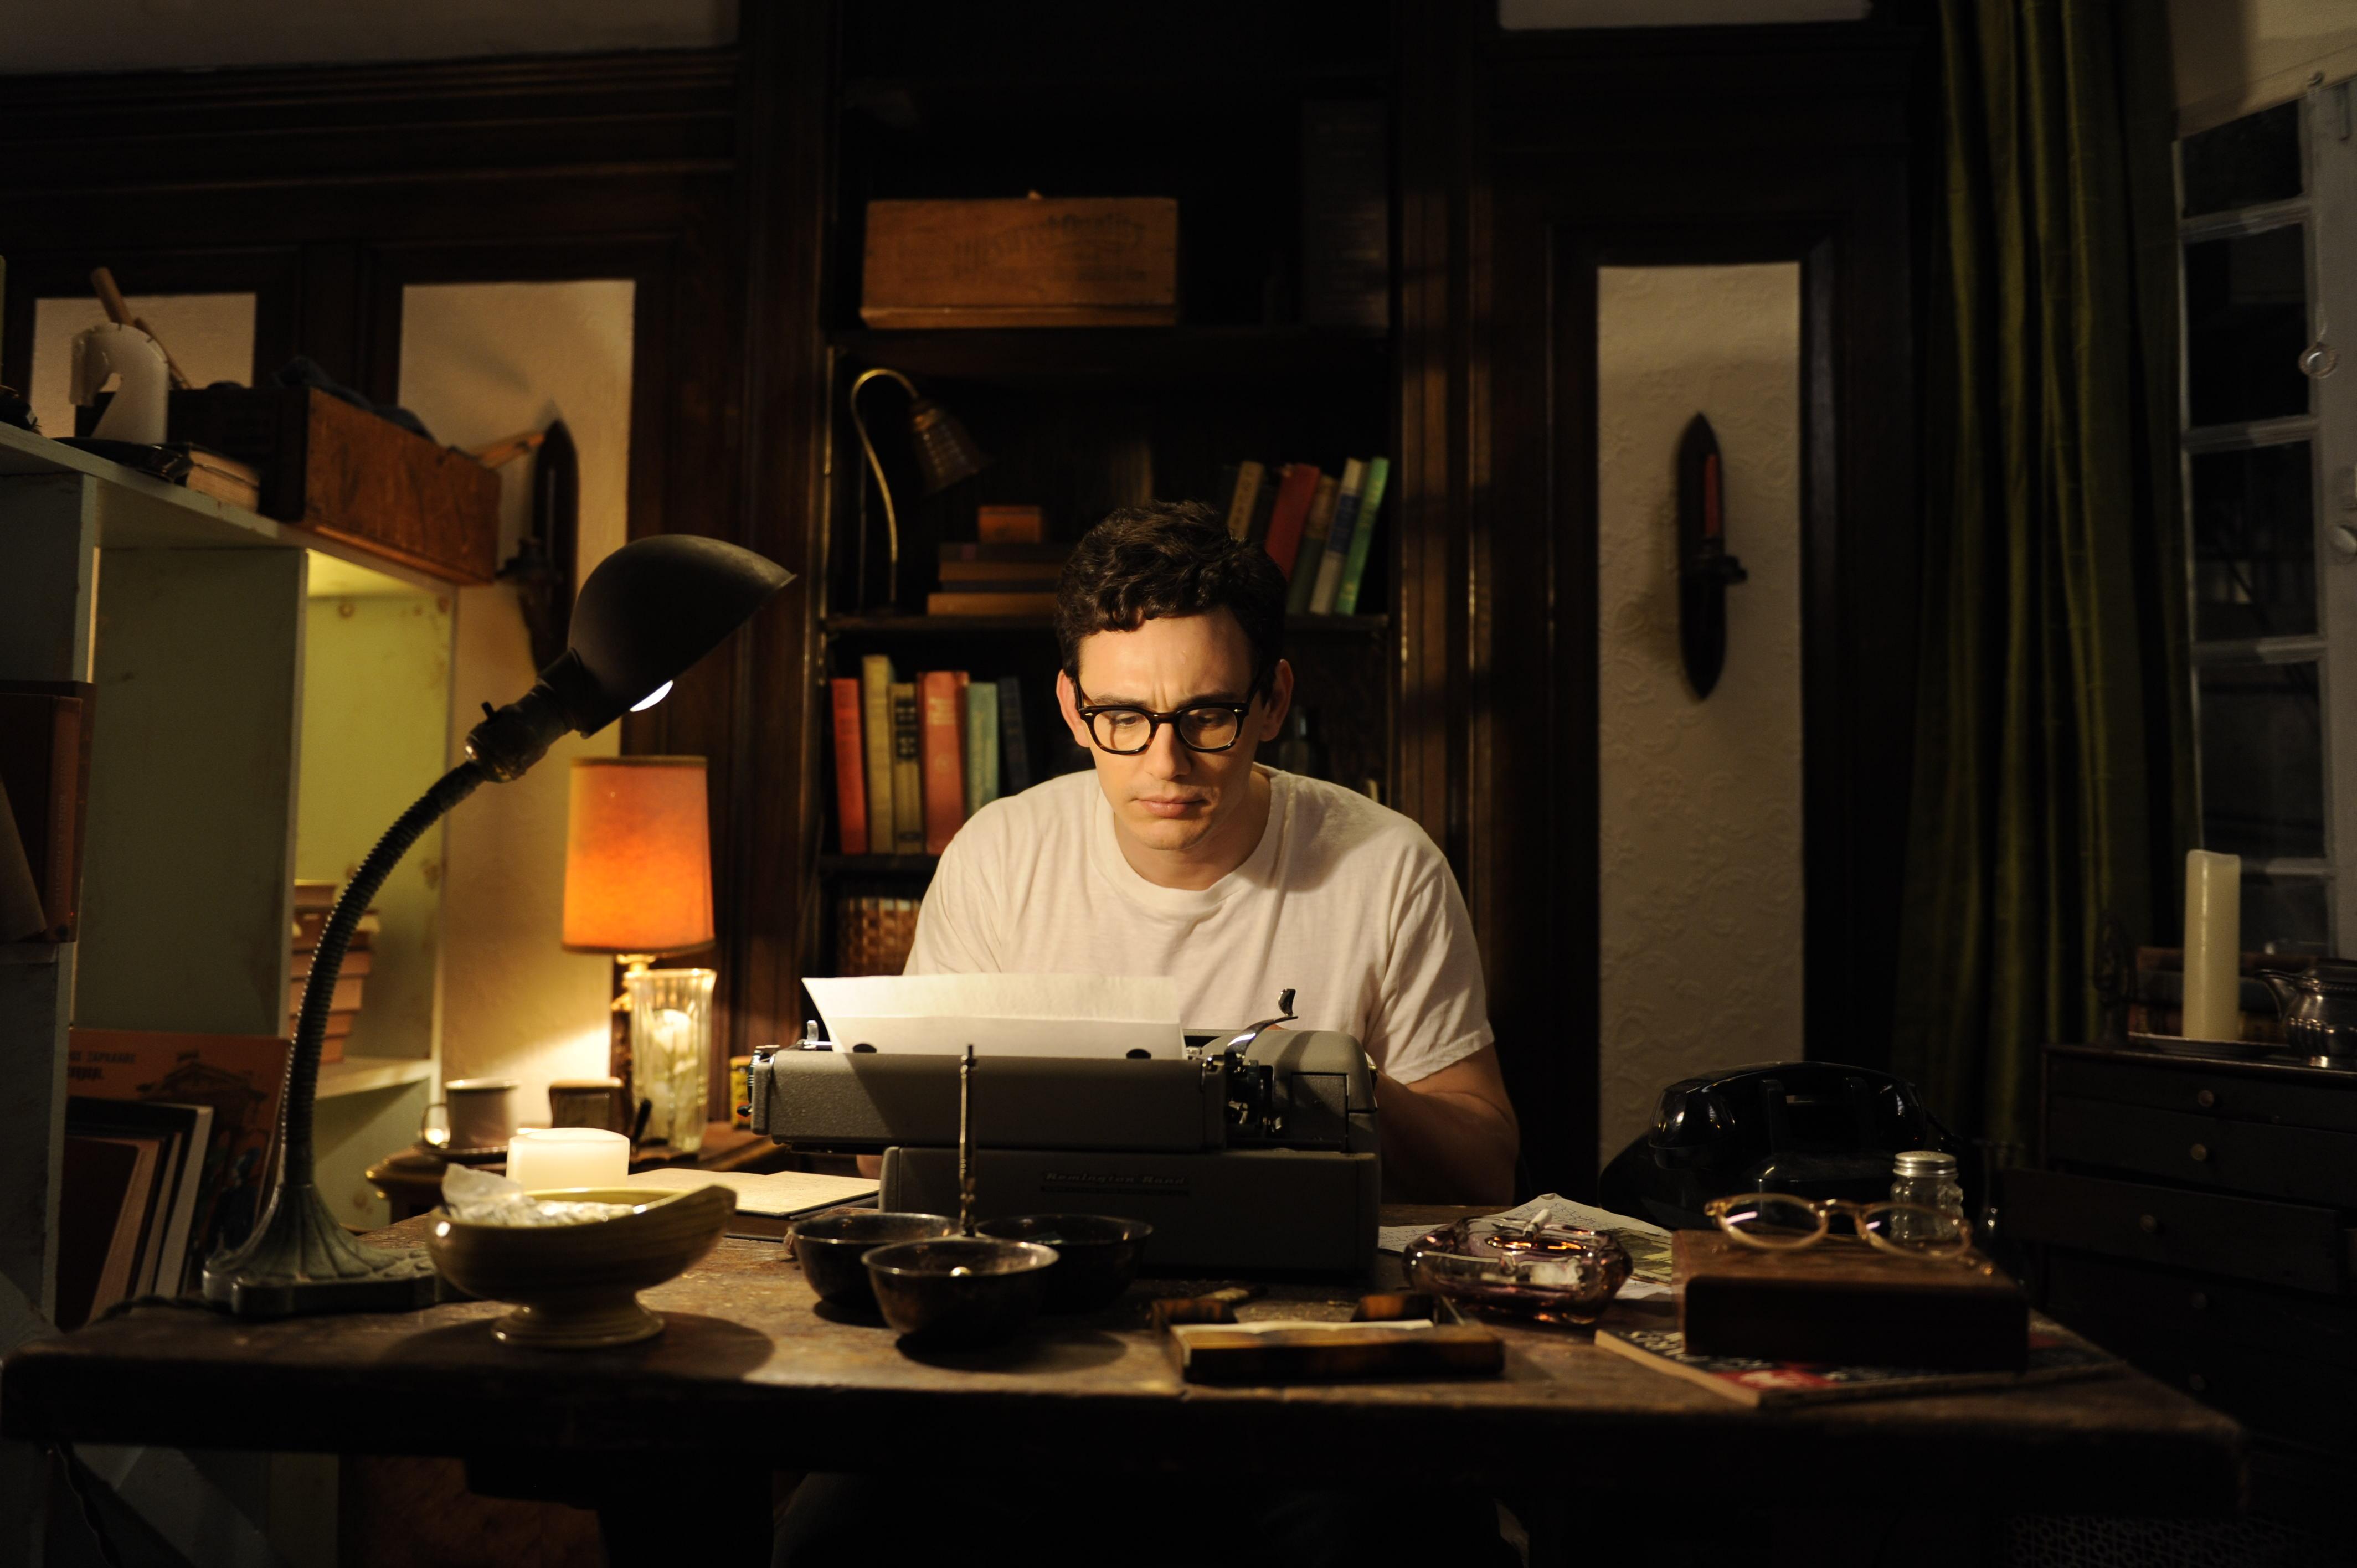 Matthew Kressel The Romanticizing Of The Writer